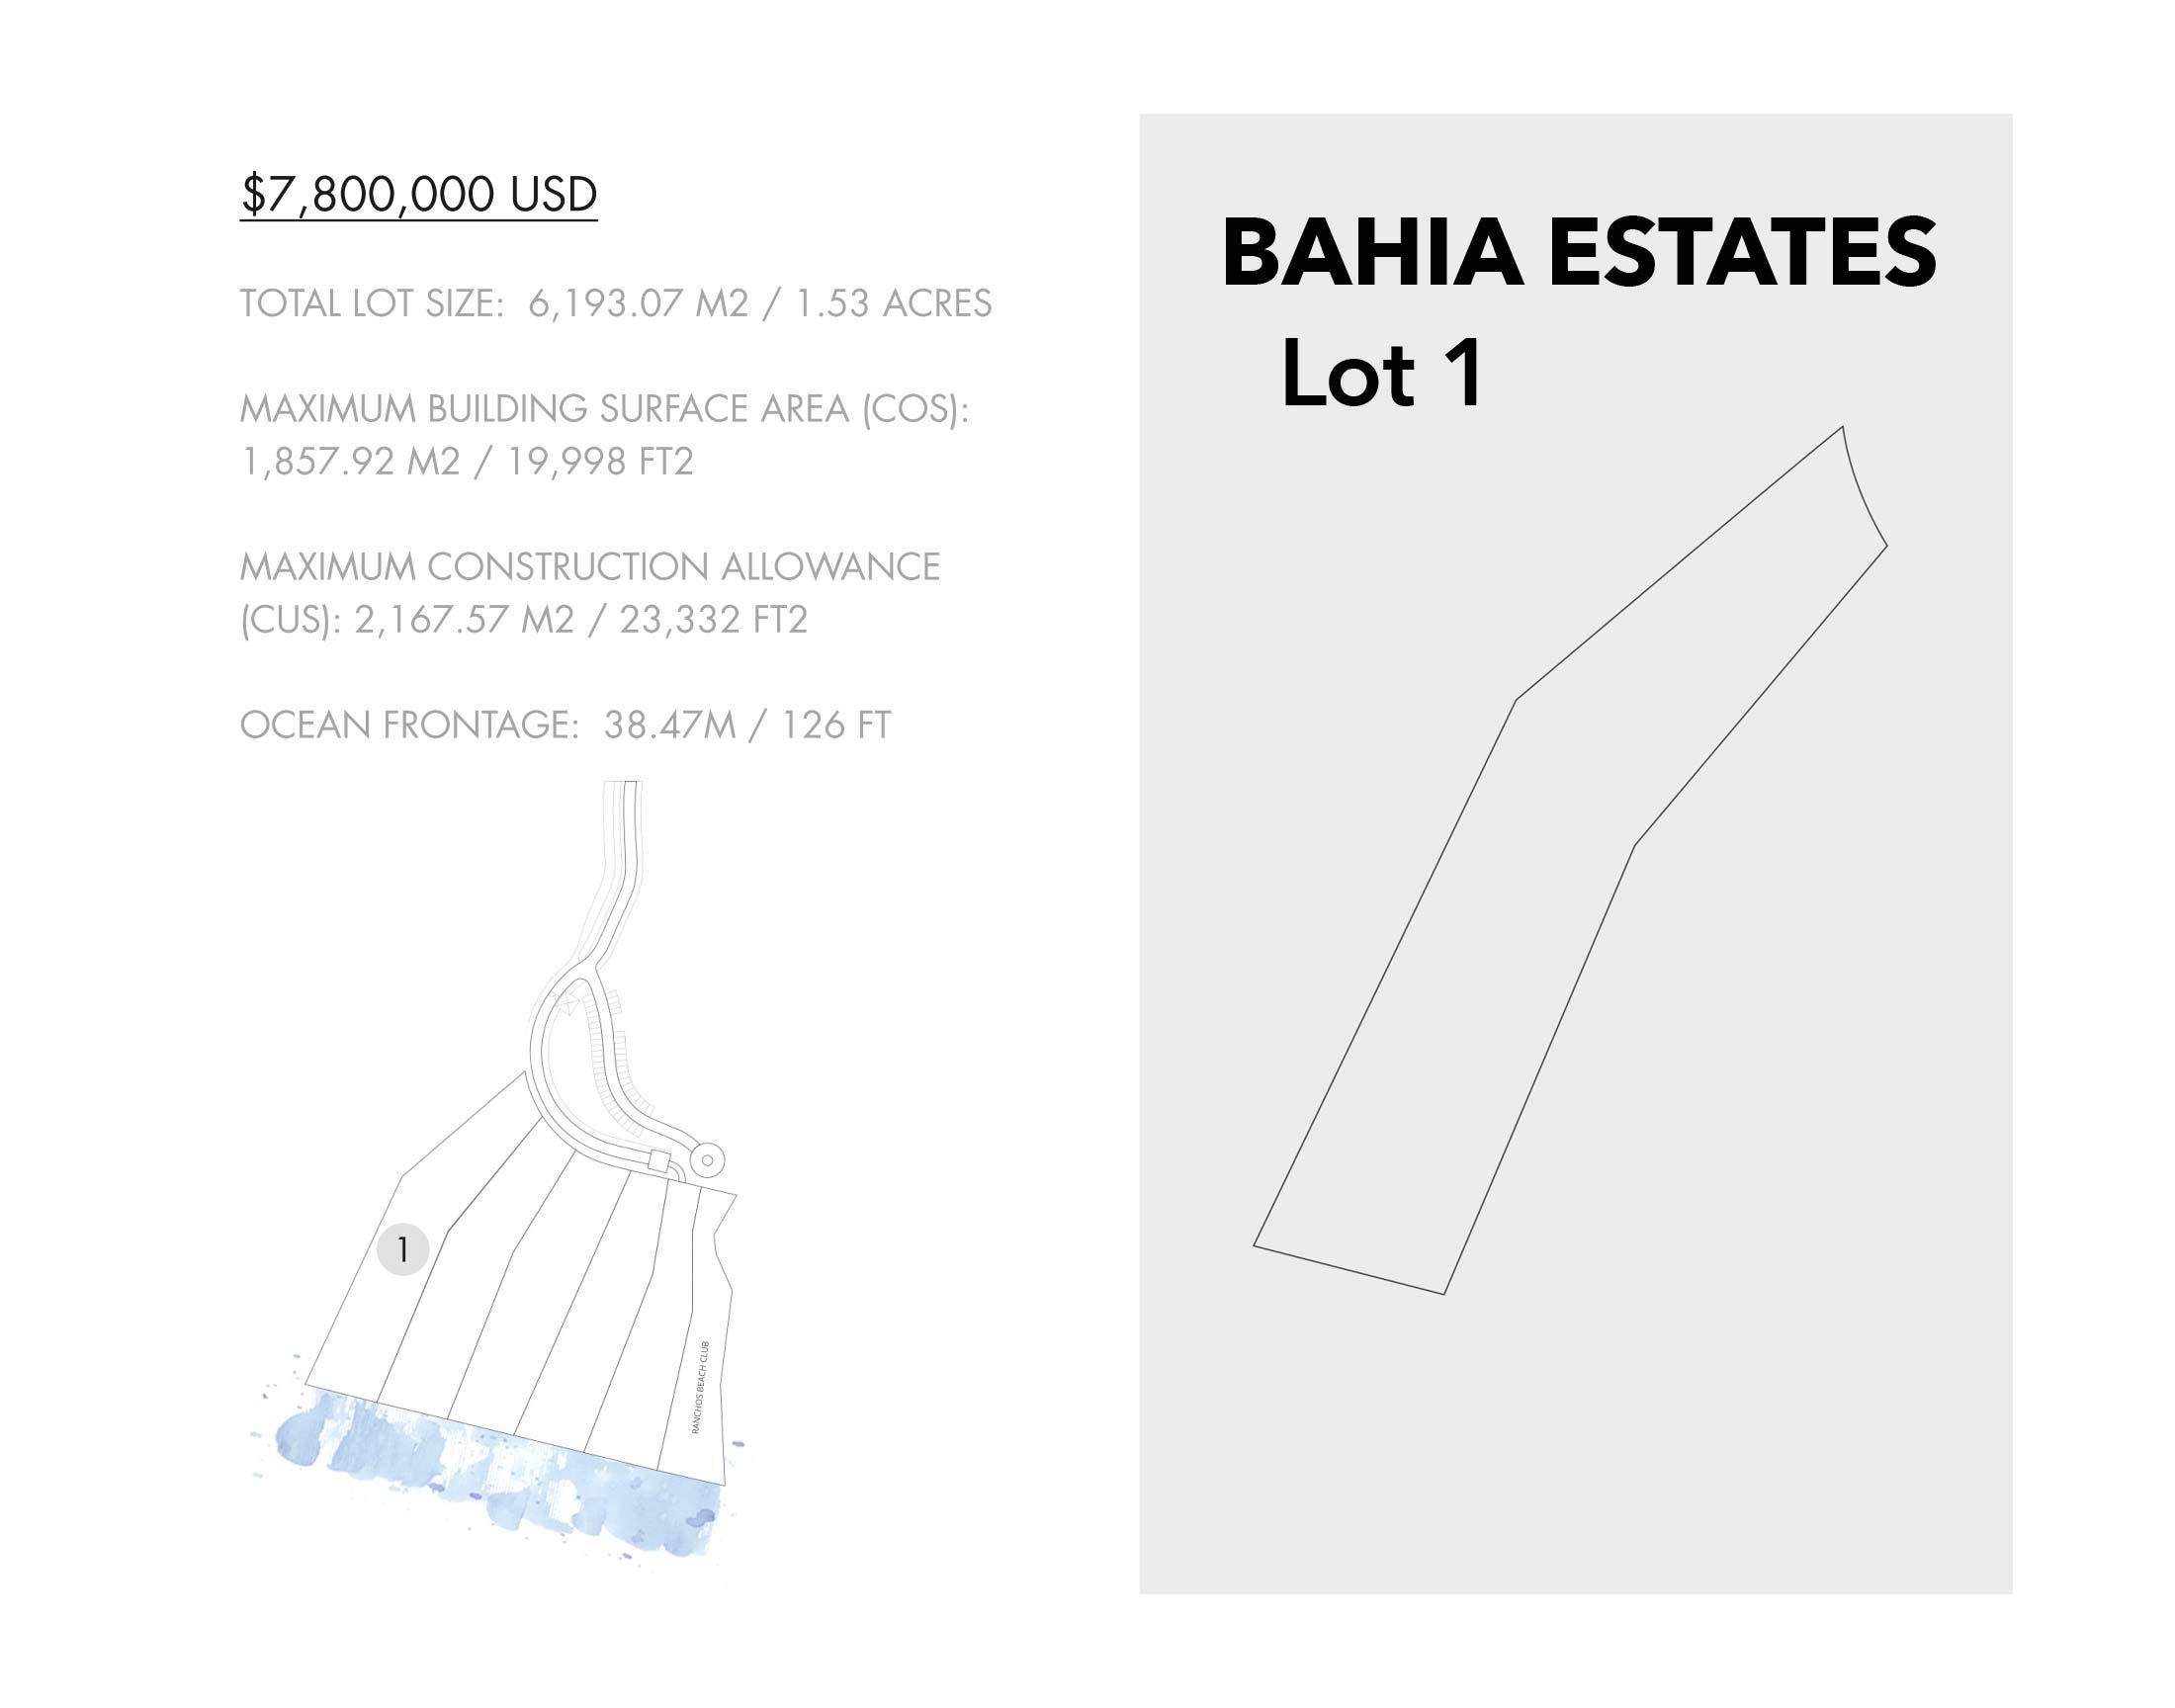 Luxury Estate Lots for Sale - Bahia Estates at the Punta Mita Resort, Riviera Nayarit, Mexico - Puerto Vallarta luxury real estate